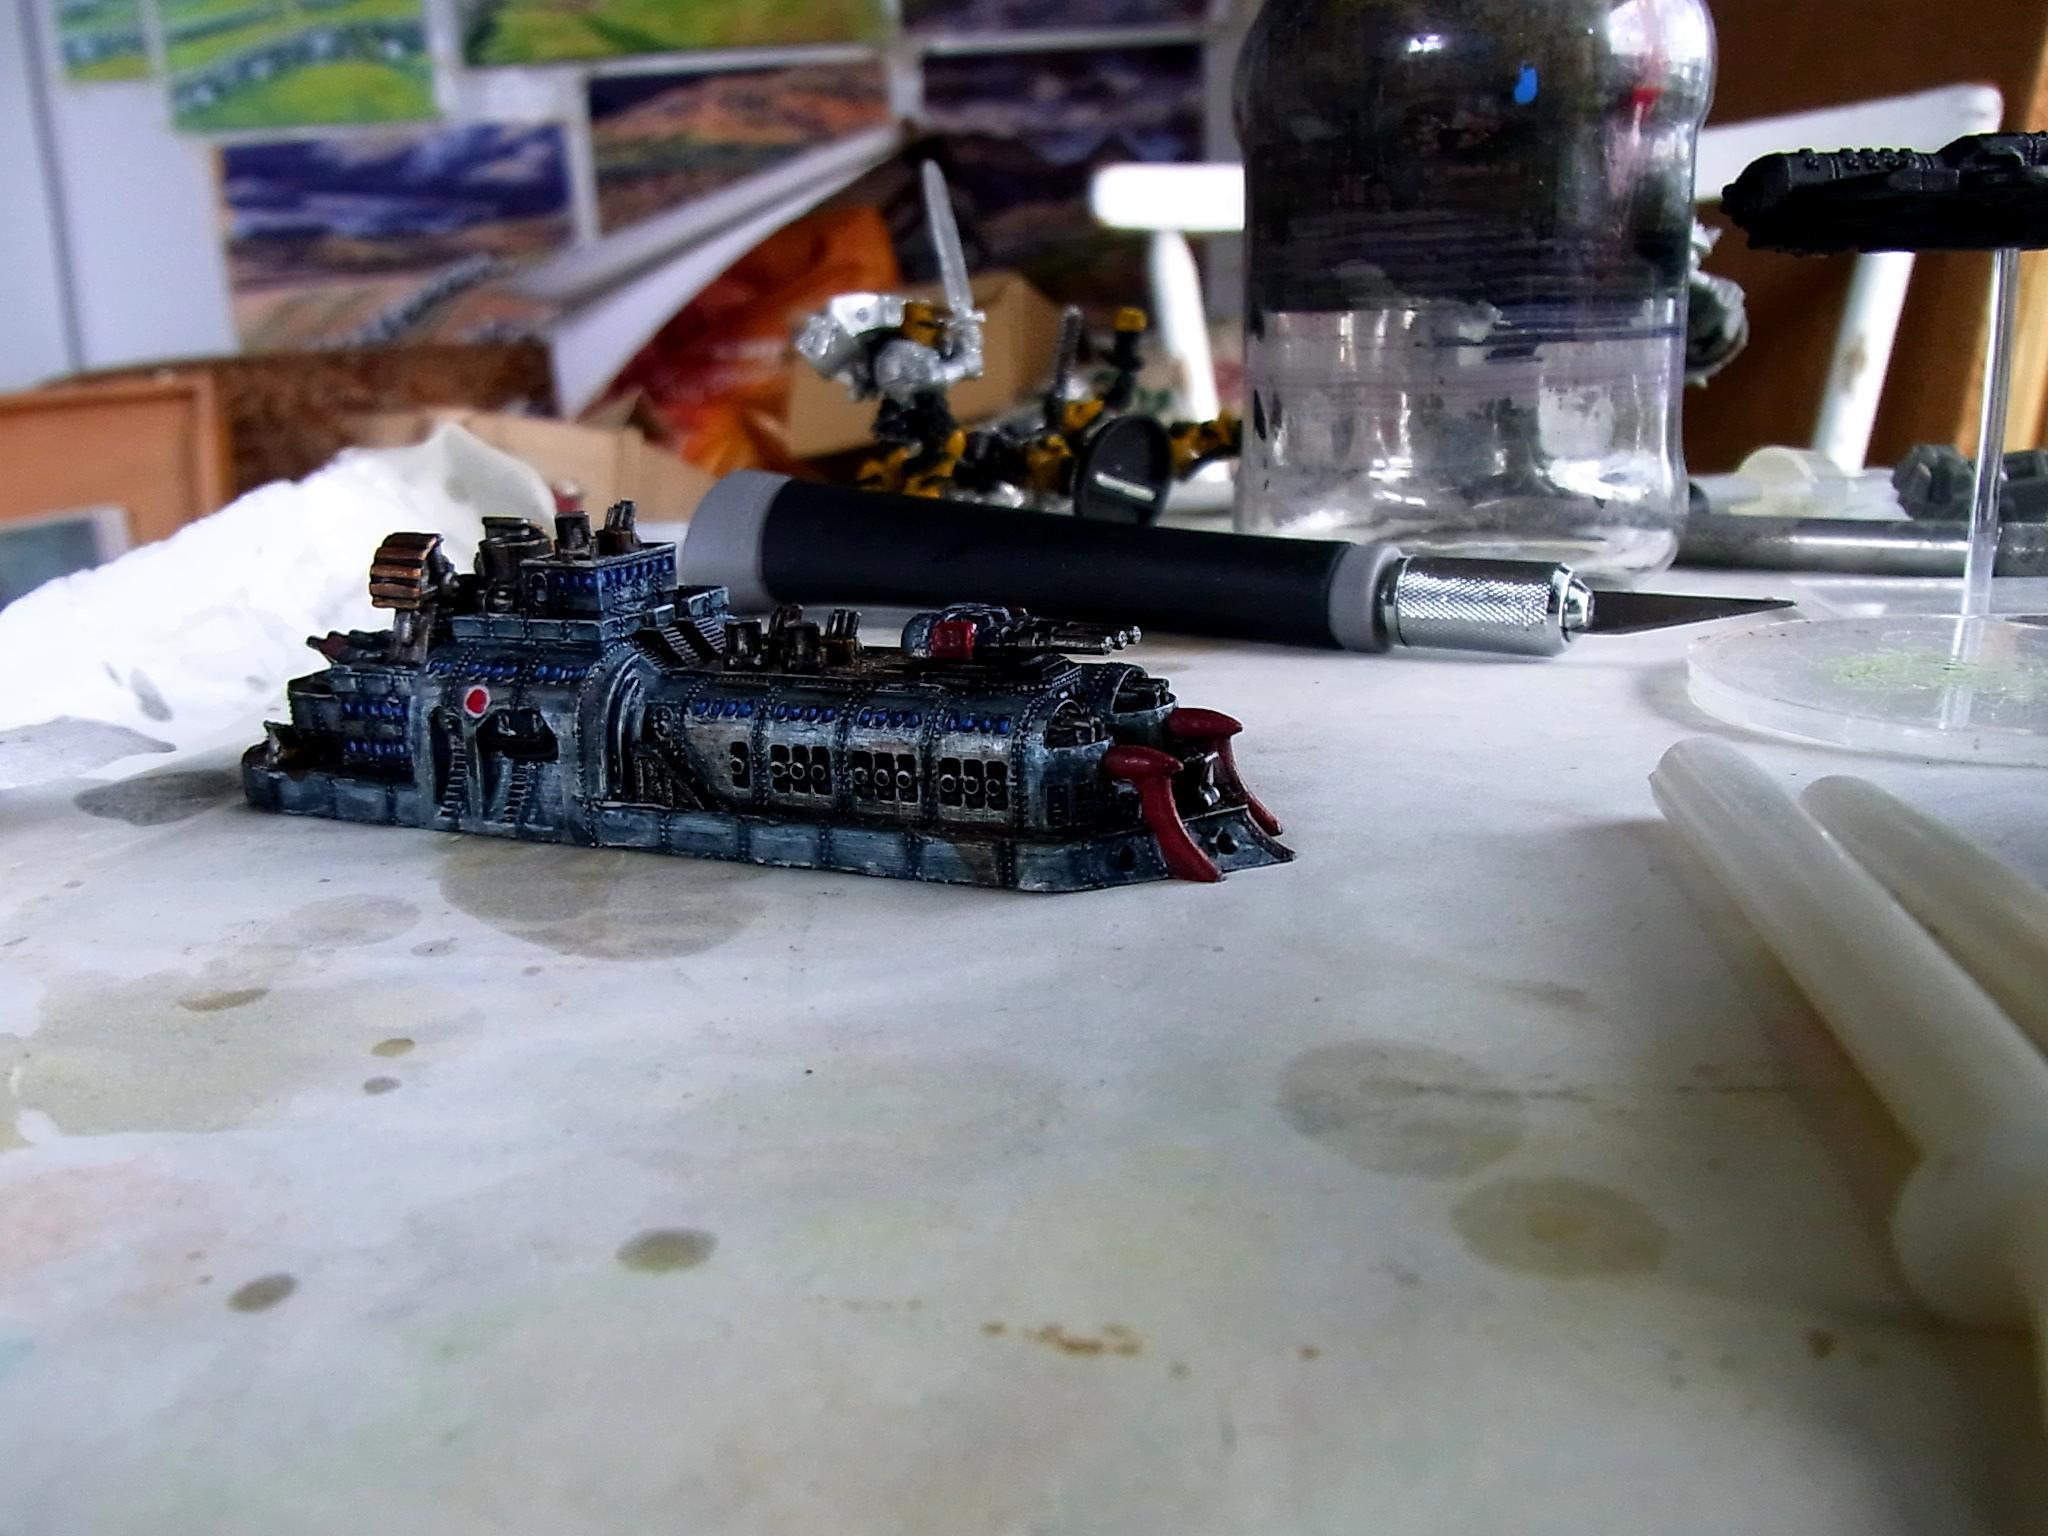 Battleship, Eotbs, Shield Generator